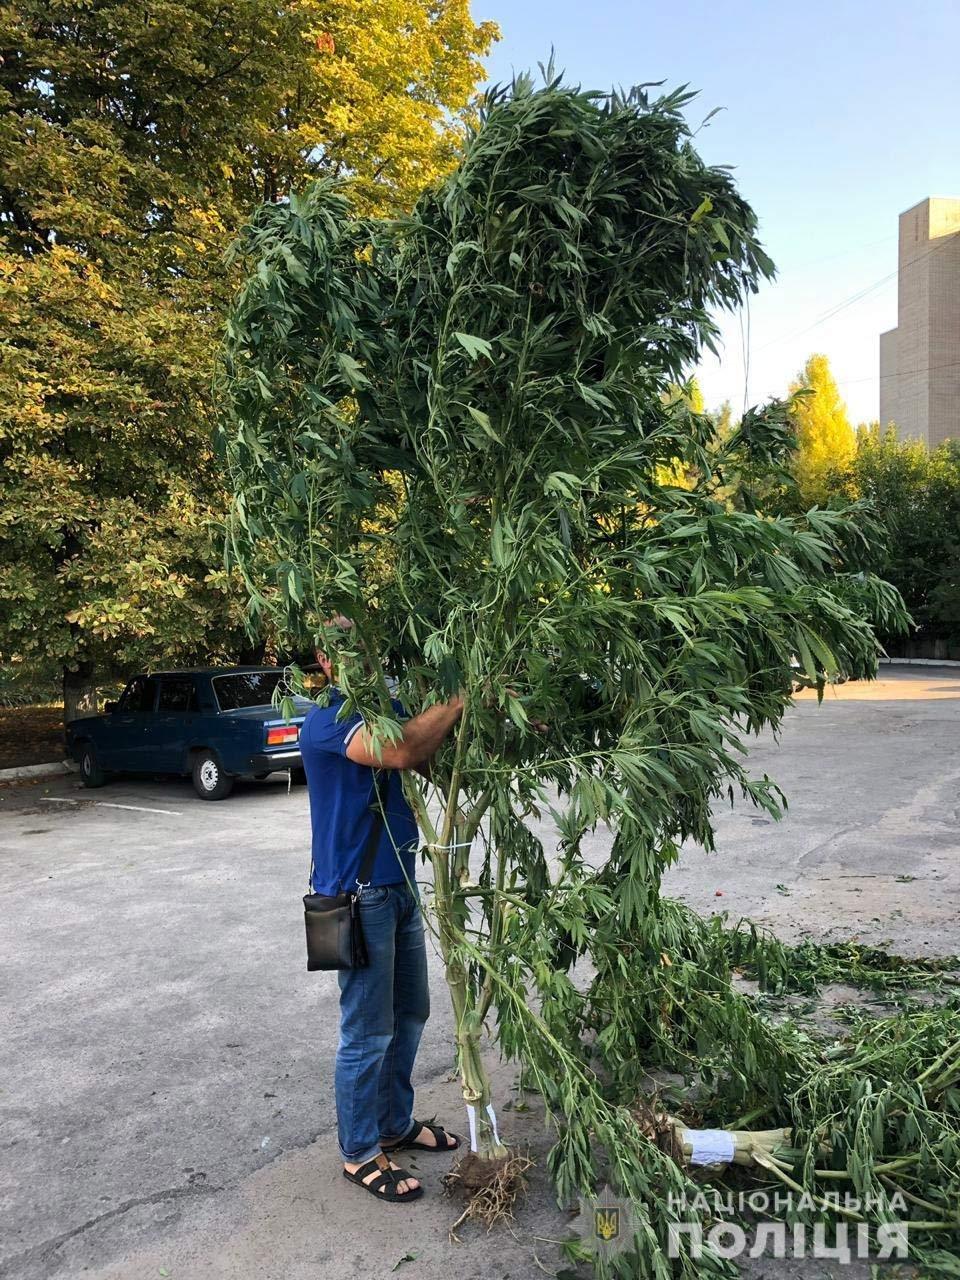 В Днепропетровской области растили трехметровую коноплю, - ФОТО, ВИДЕО, фото-1